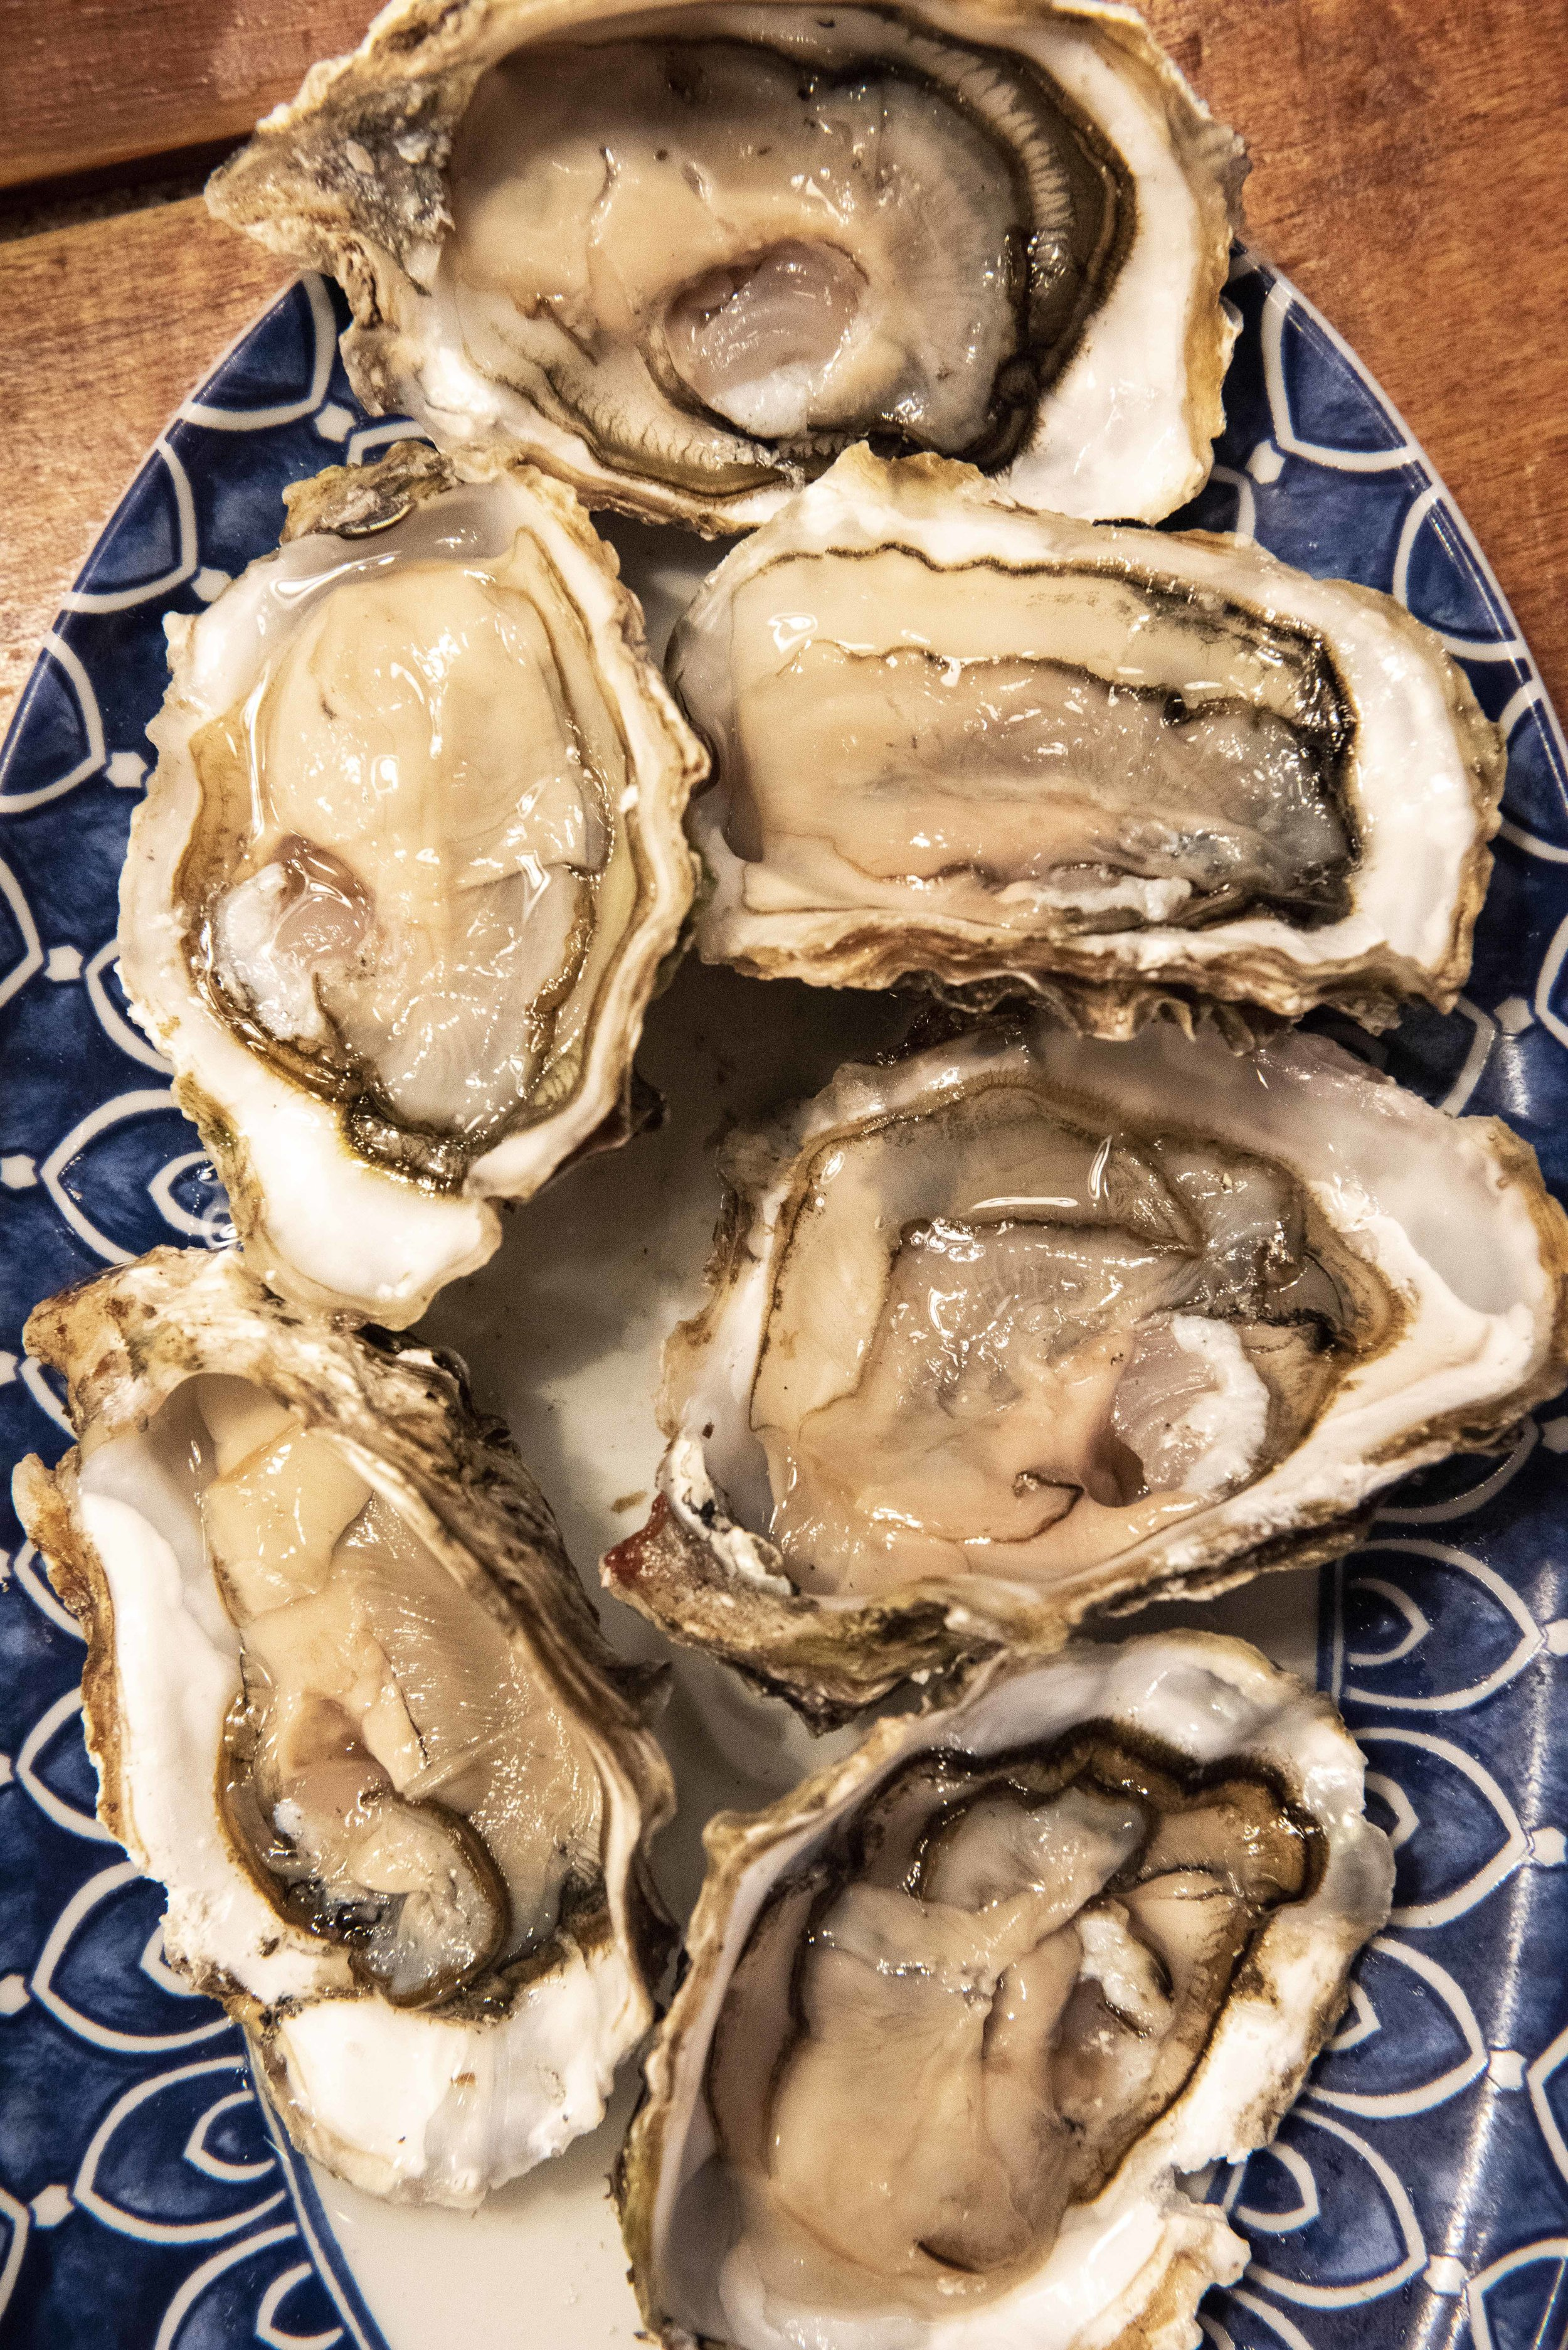 Oysters at Bodega La Puntual. Photo © Barcelona Food Experience.